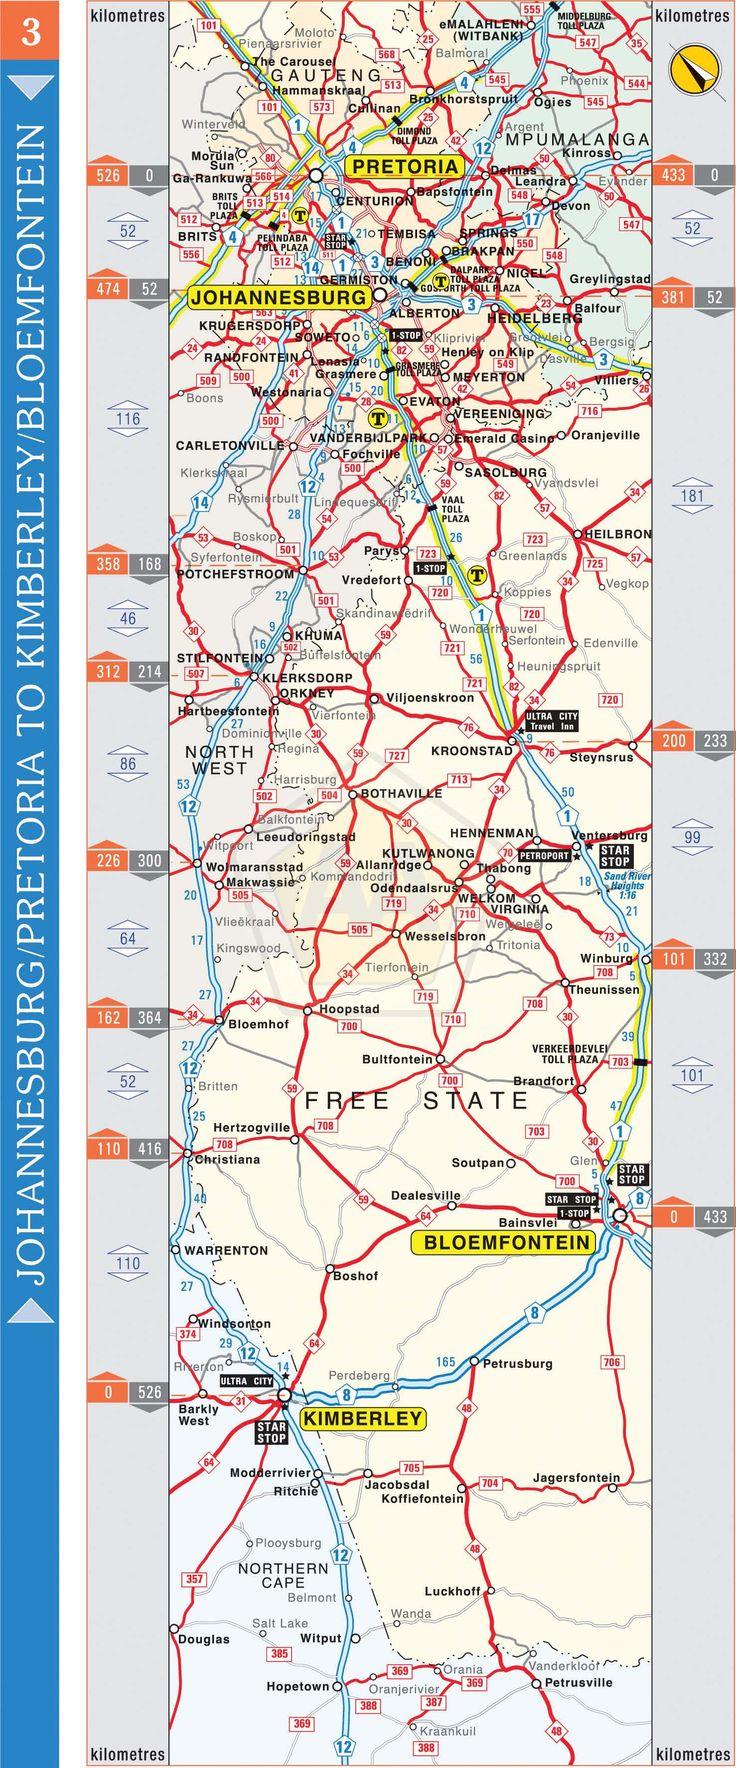 Johannesburg / Pretoria to Kimberley / Bloemfontein | Automobile Association